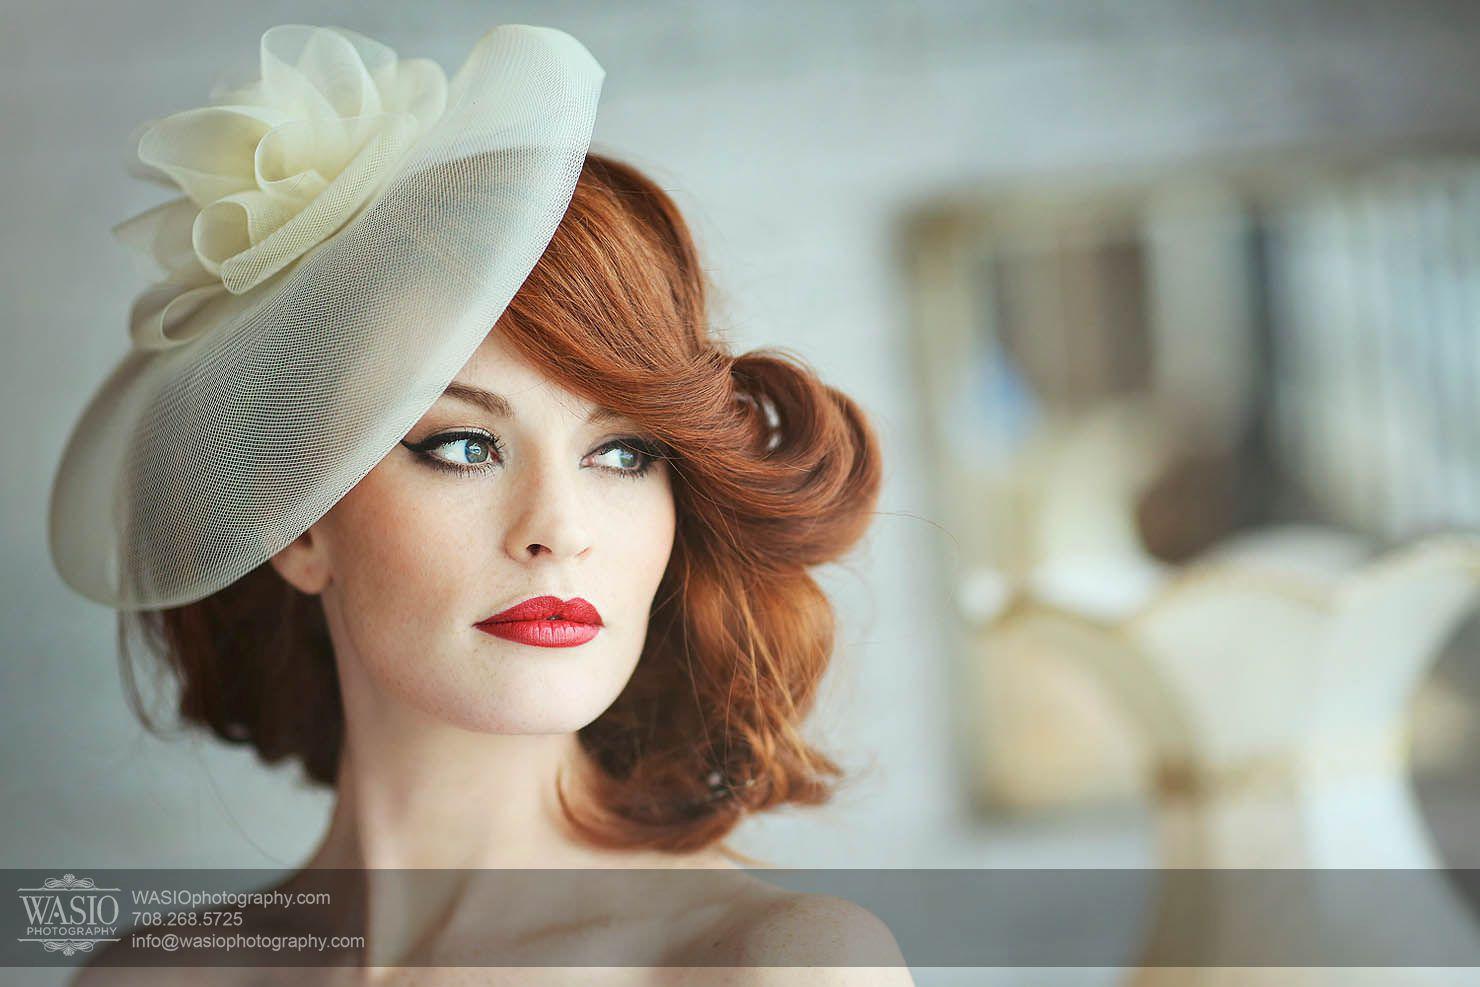 Salvage-one-wedding-chicago-vintage-bride-beautiful-redhead1 Top Wedding Photographers